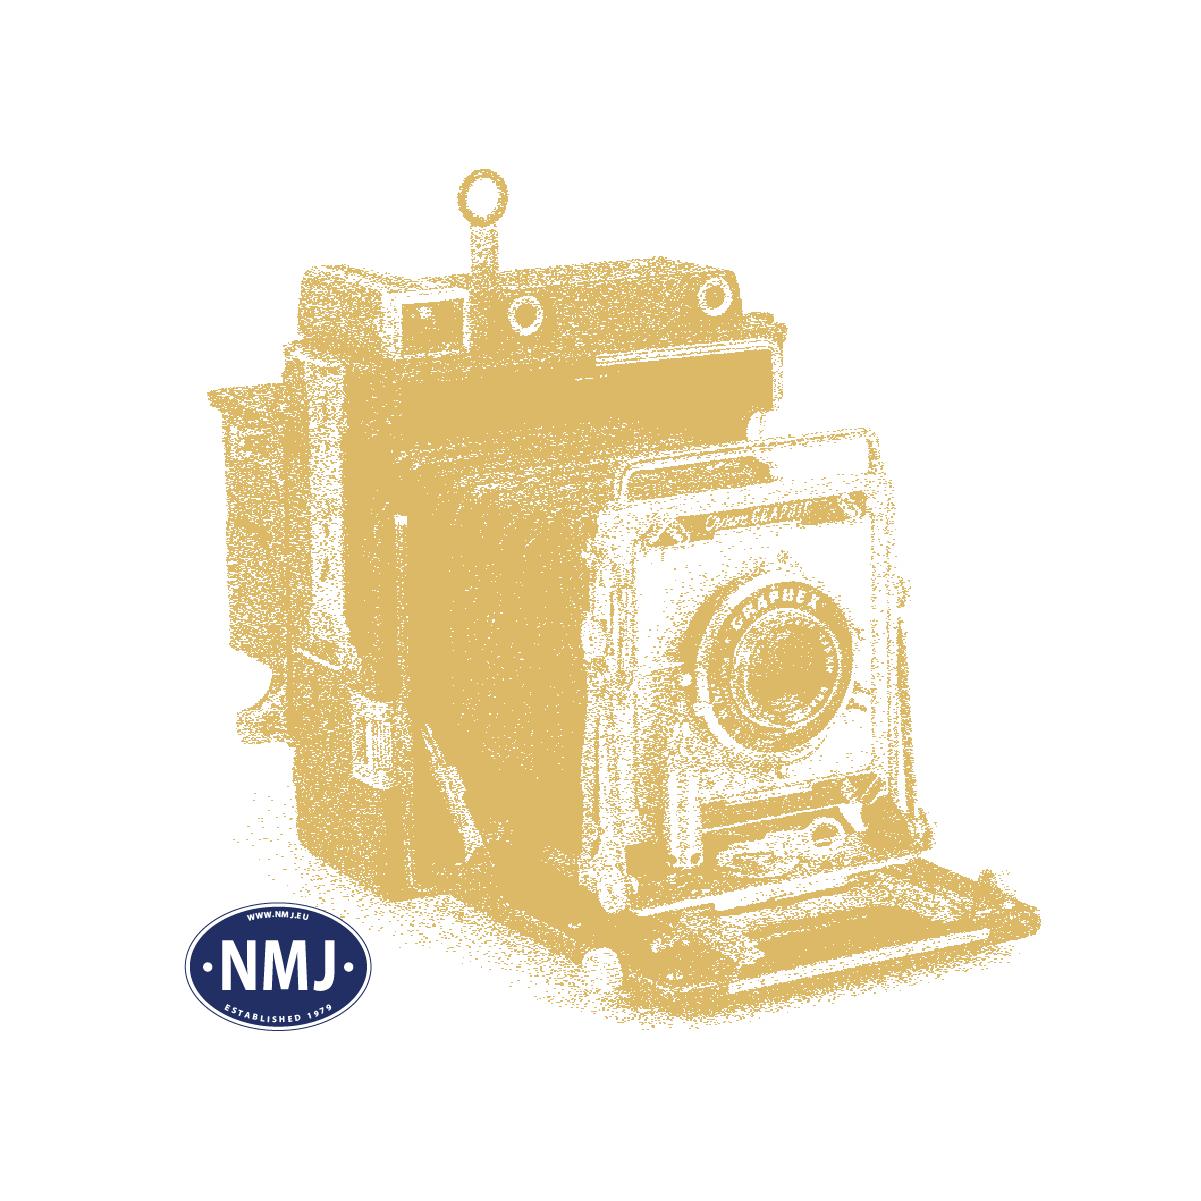 NMJT504.103 - NMJ Topline NSB His 210 2 198-9, type 1